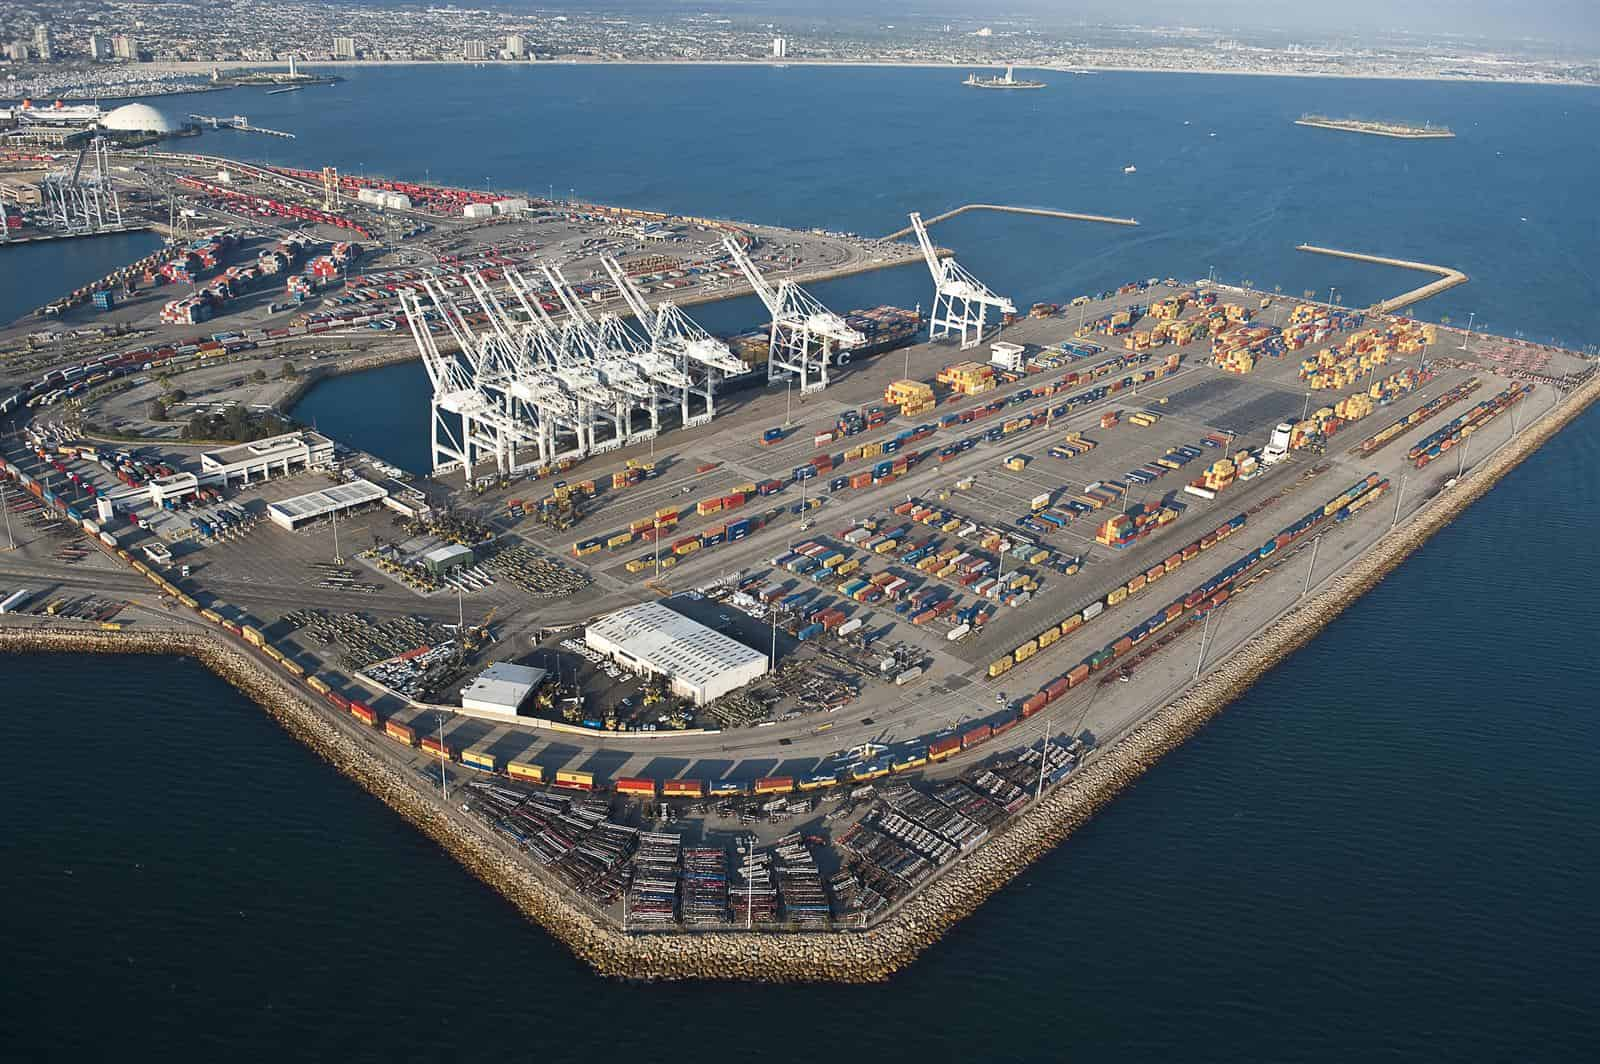 Long Beach May growth surpasses LA's, but east coast threat looms